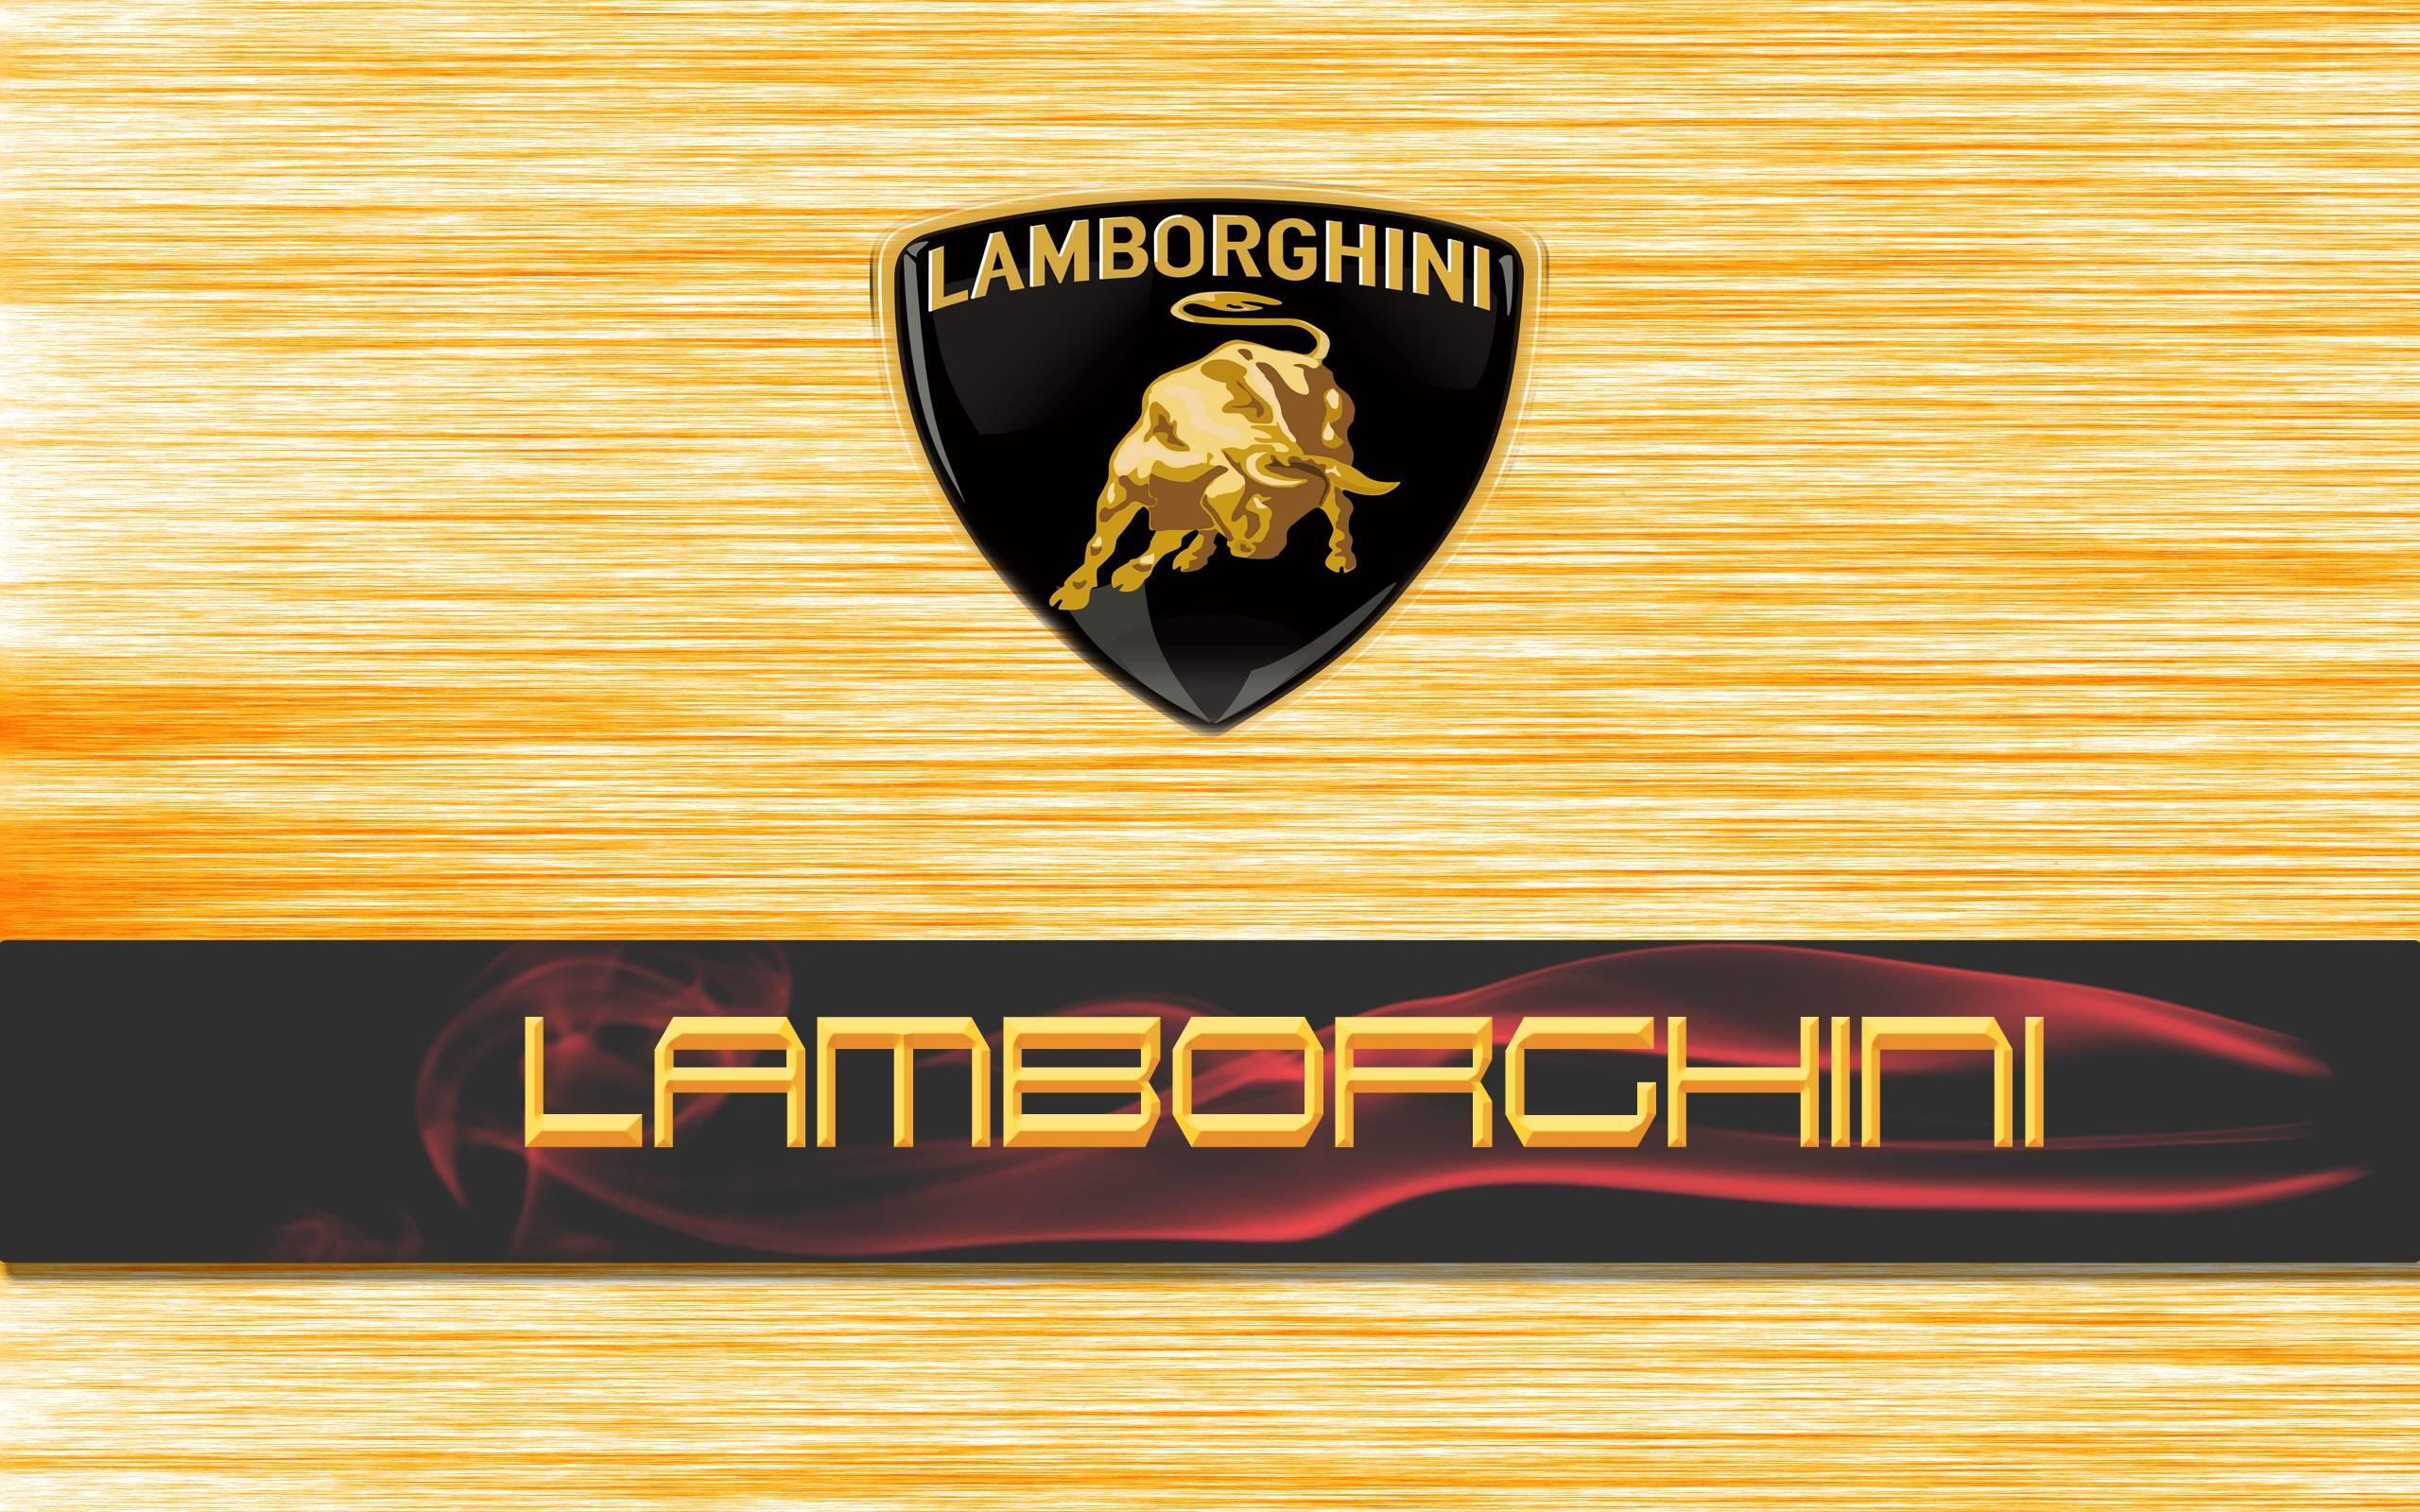 1920x1440 Lamborghini Gallardo Valentino Balboni Wallpapers